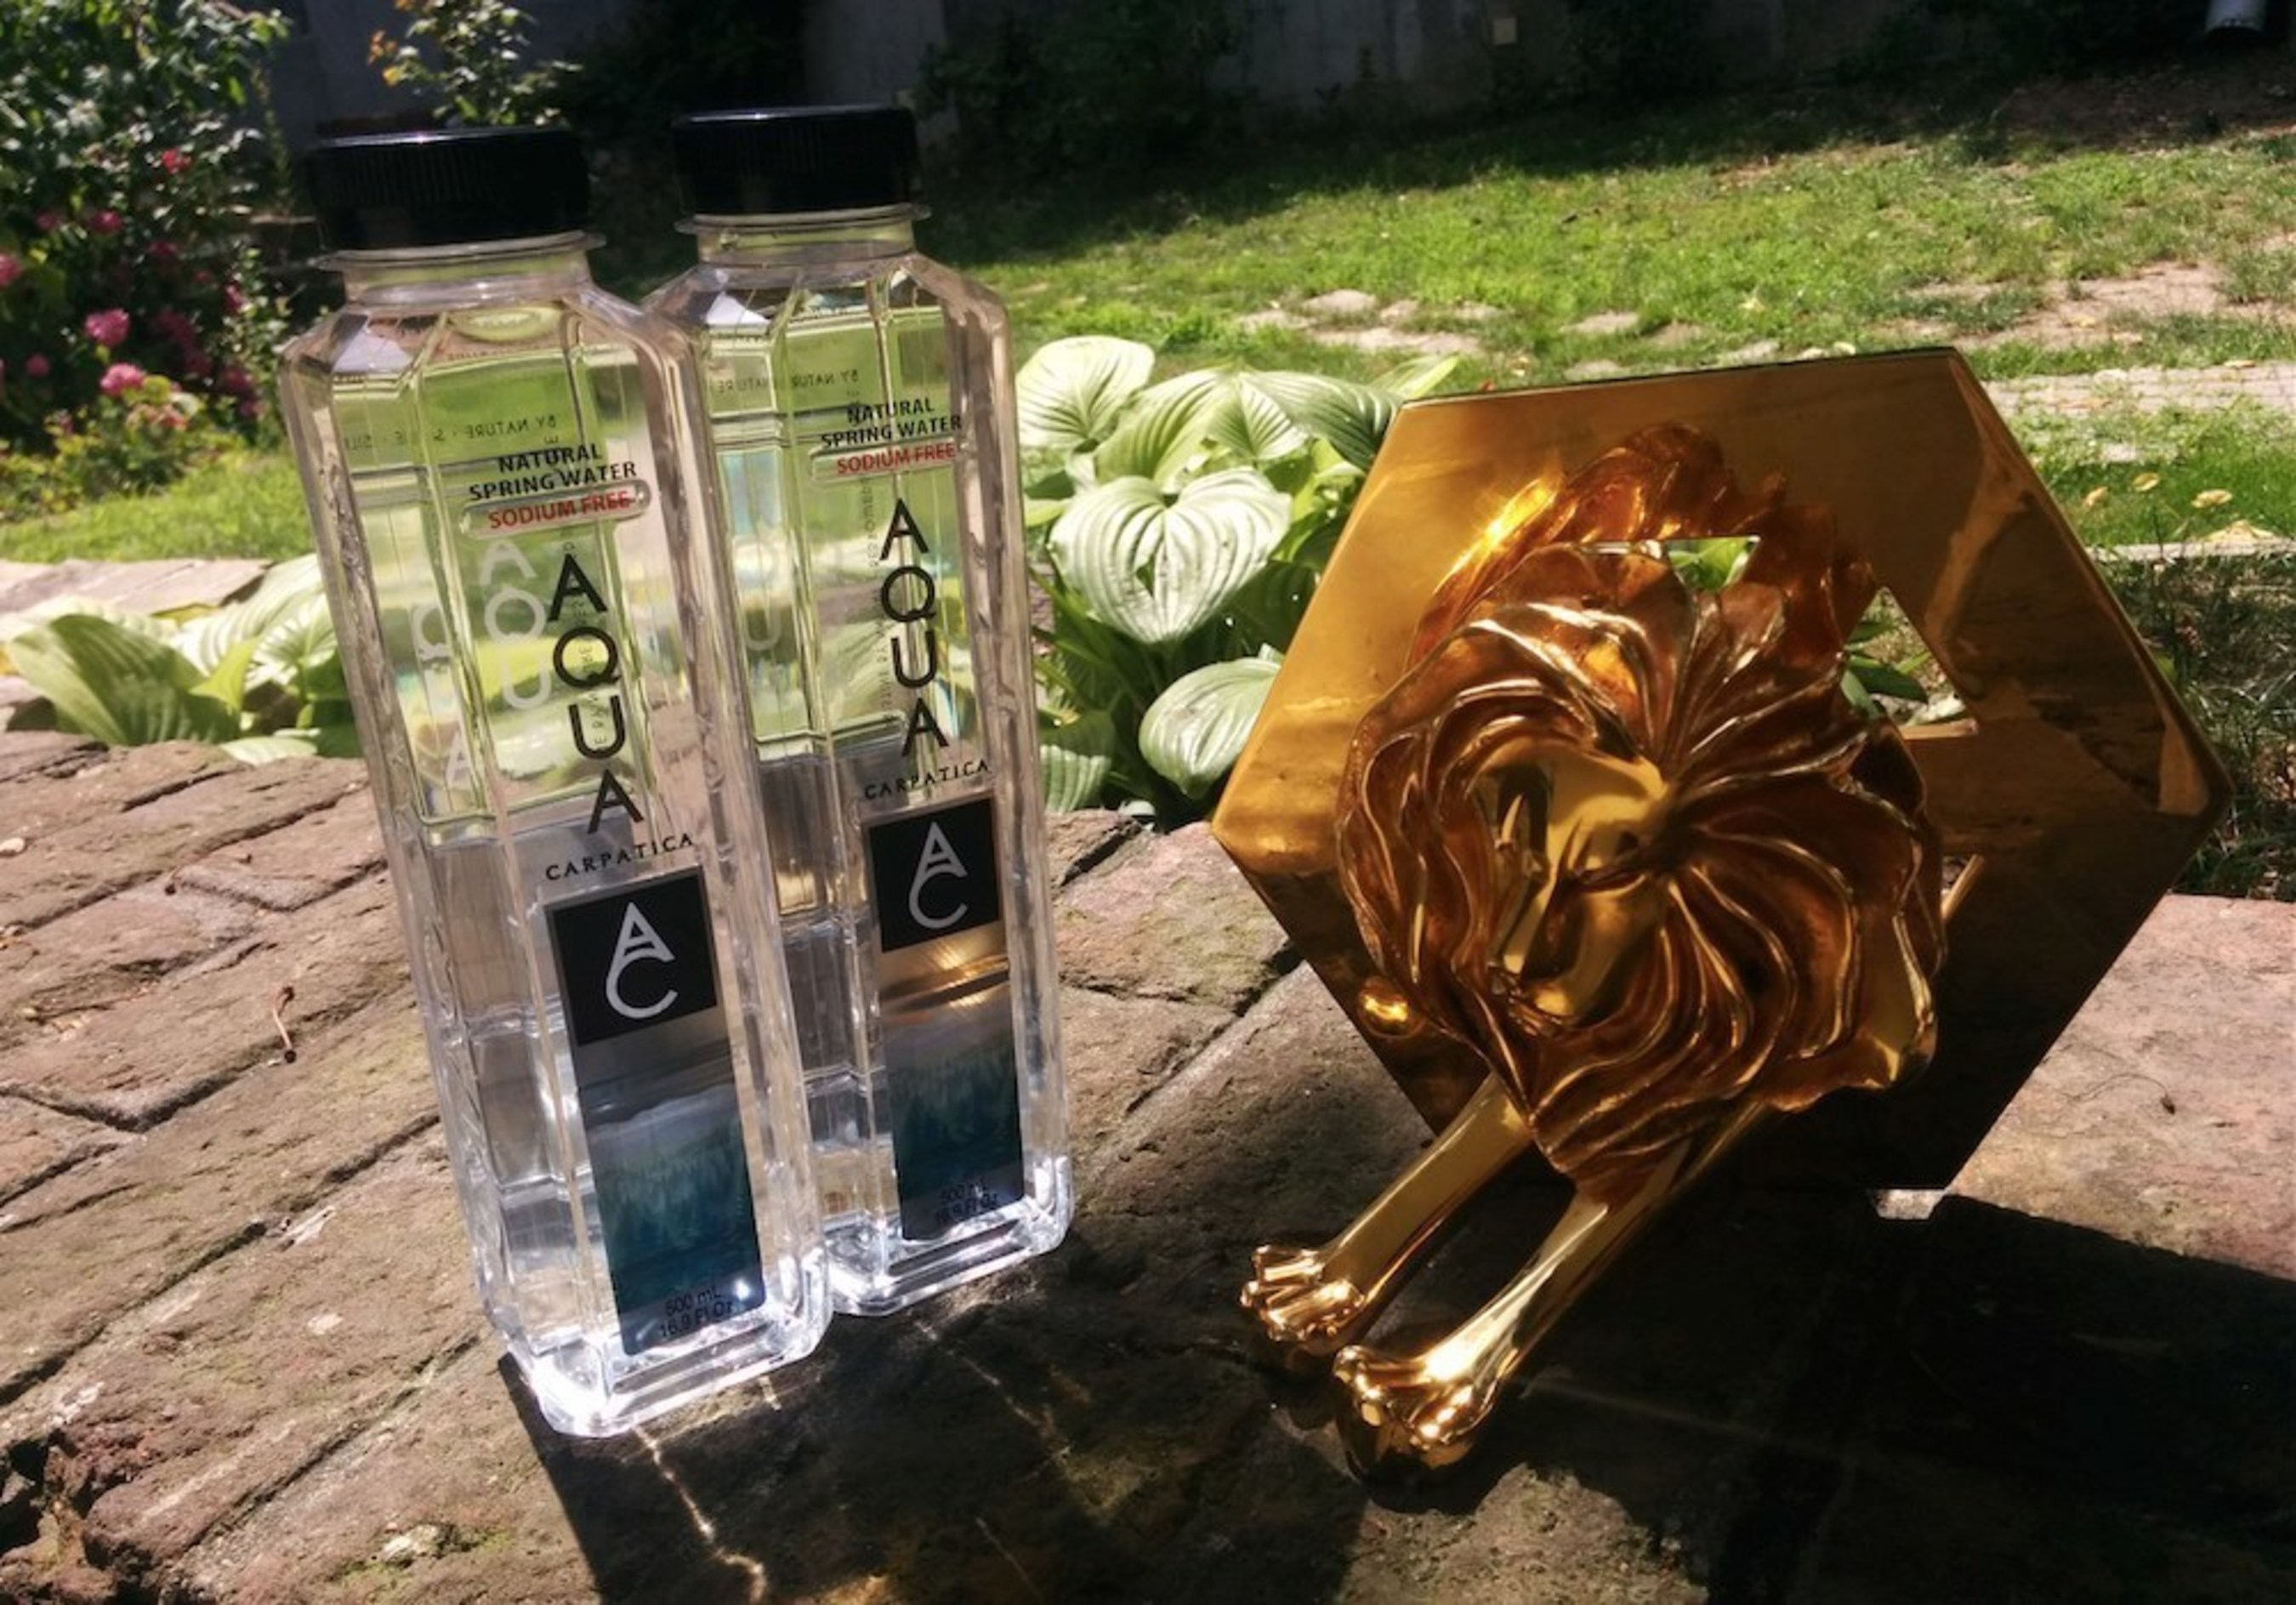 AQUA Carpatica Earns Gold Lion Award at Cannes International Festival of Creativity